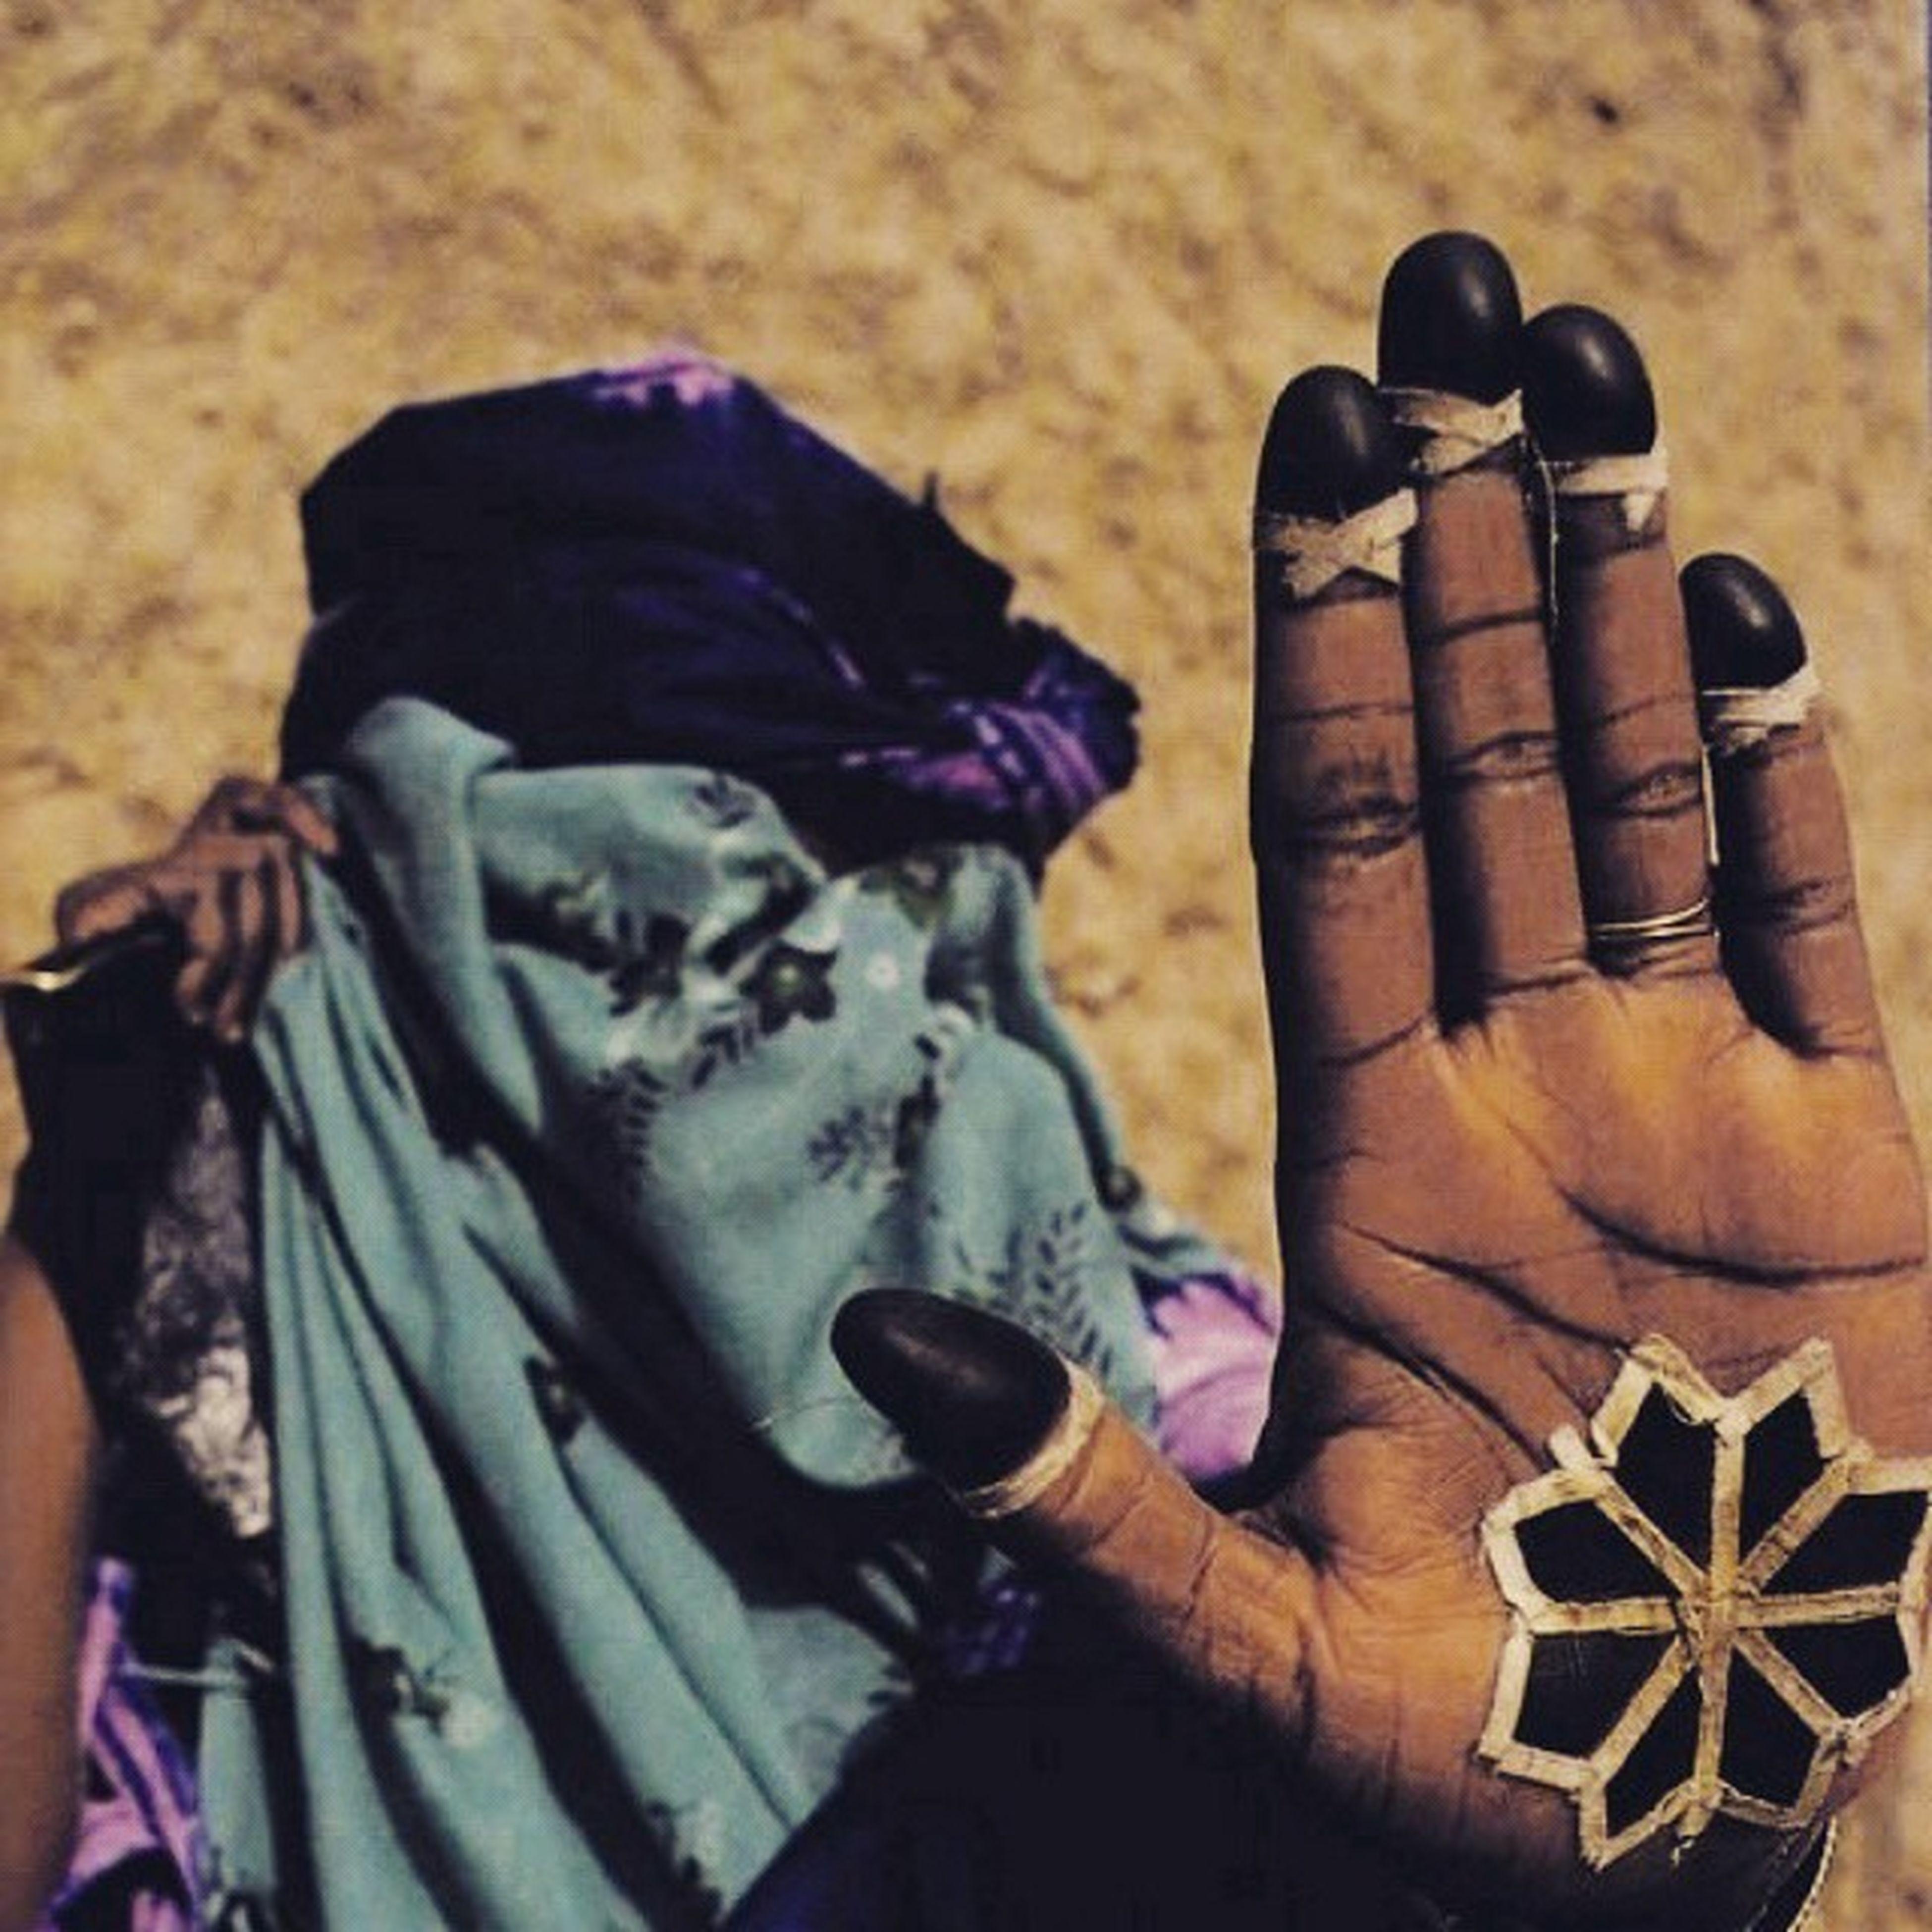 Inspirations Tattoo Woman Henne Berberwoman inspiration